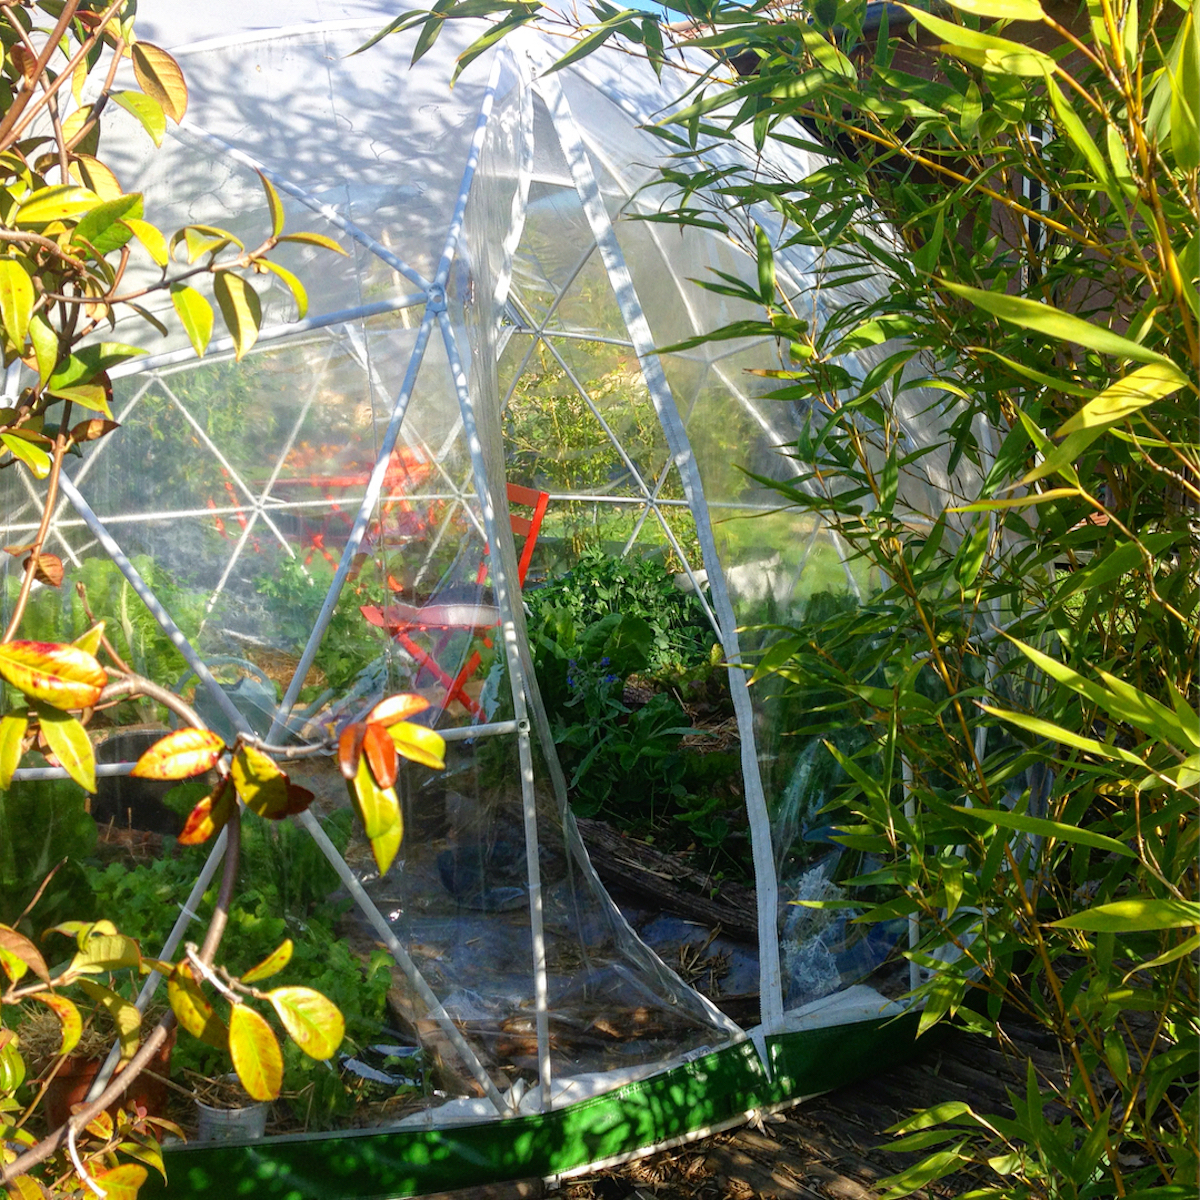 garden igloo bulle de jardin potager jardinage serre design originale - blog déco - clematc